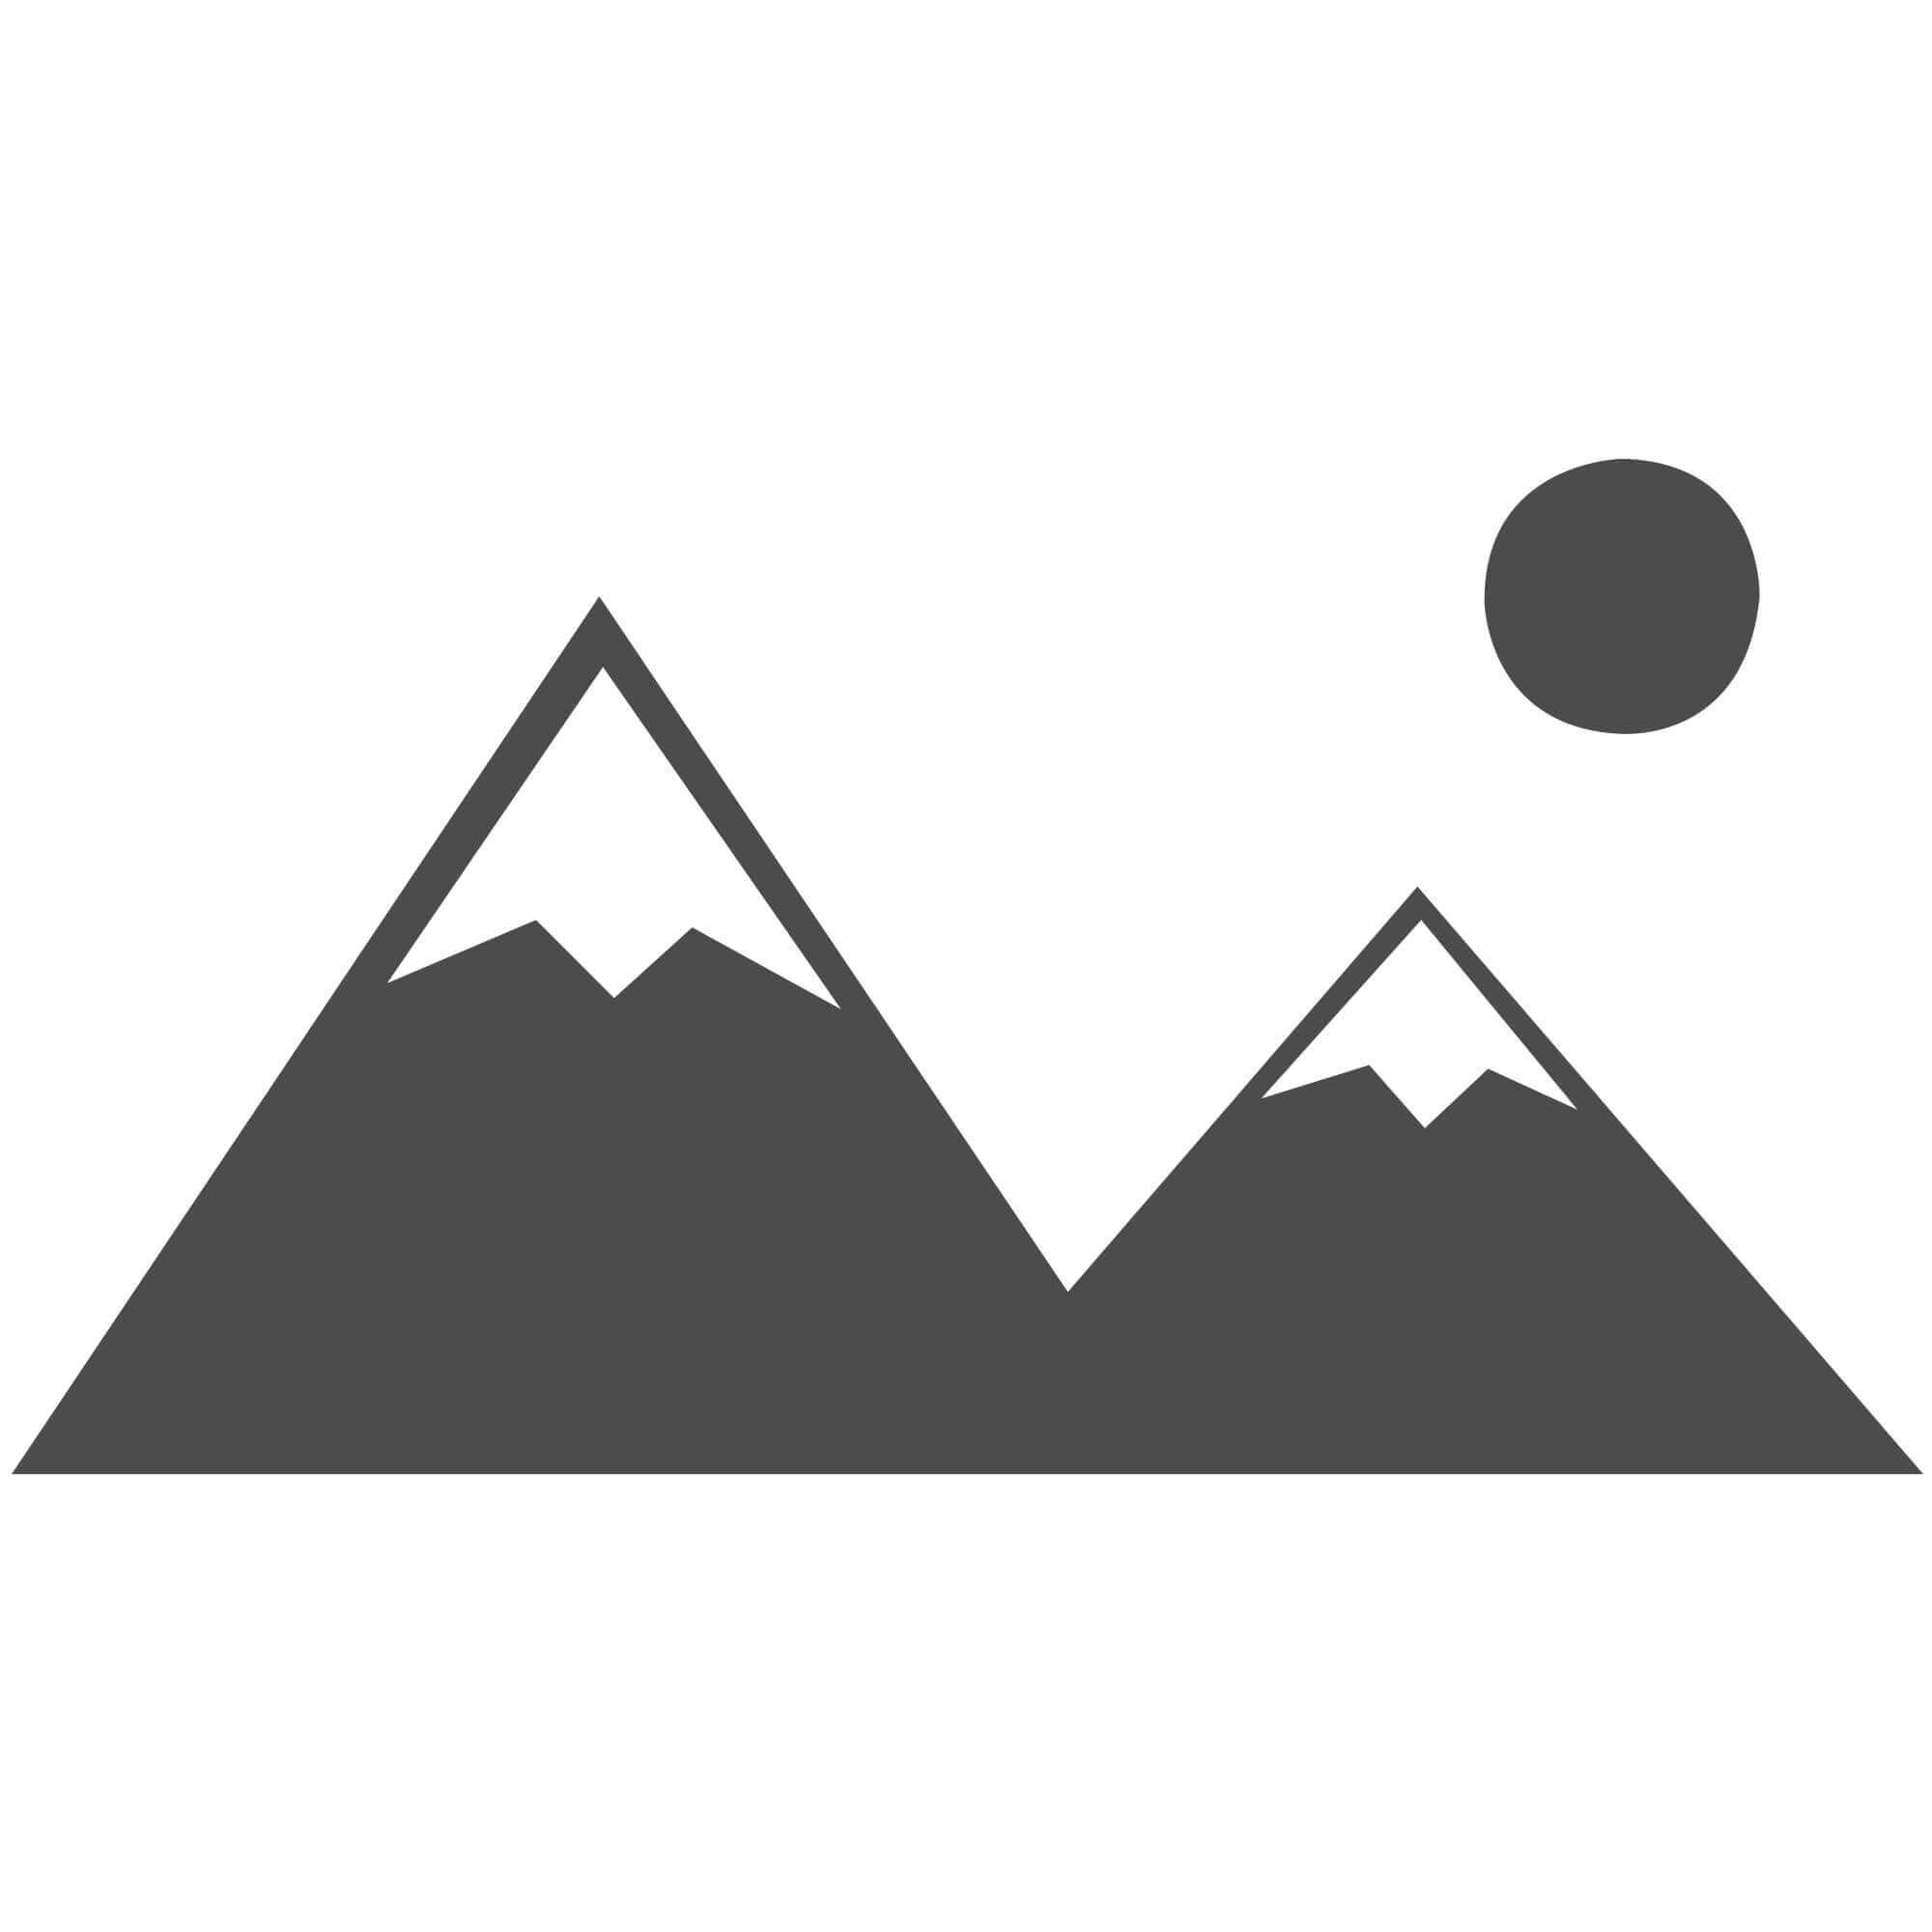 Vision Trimline TL170 Trimless